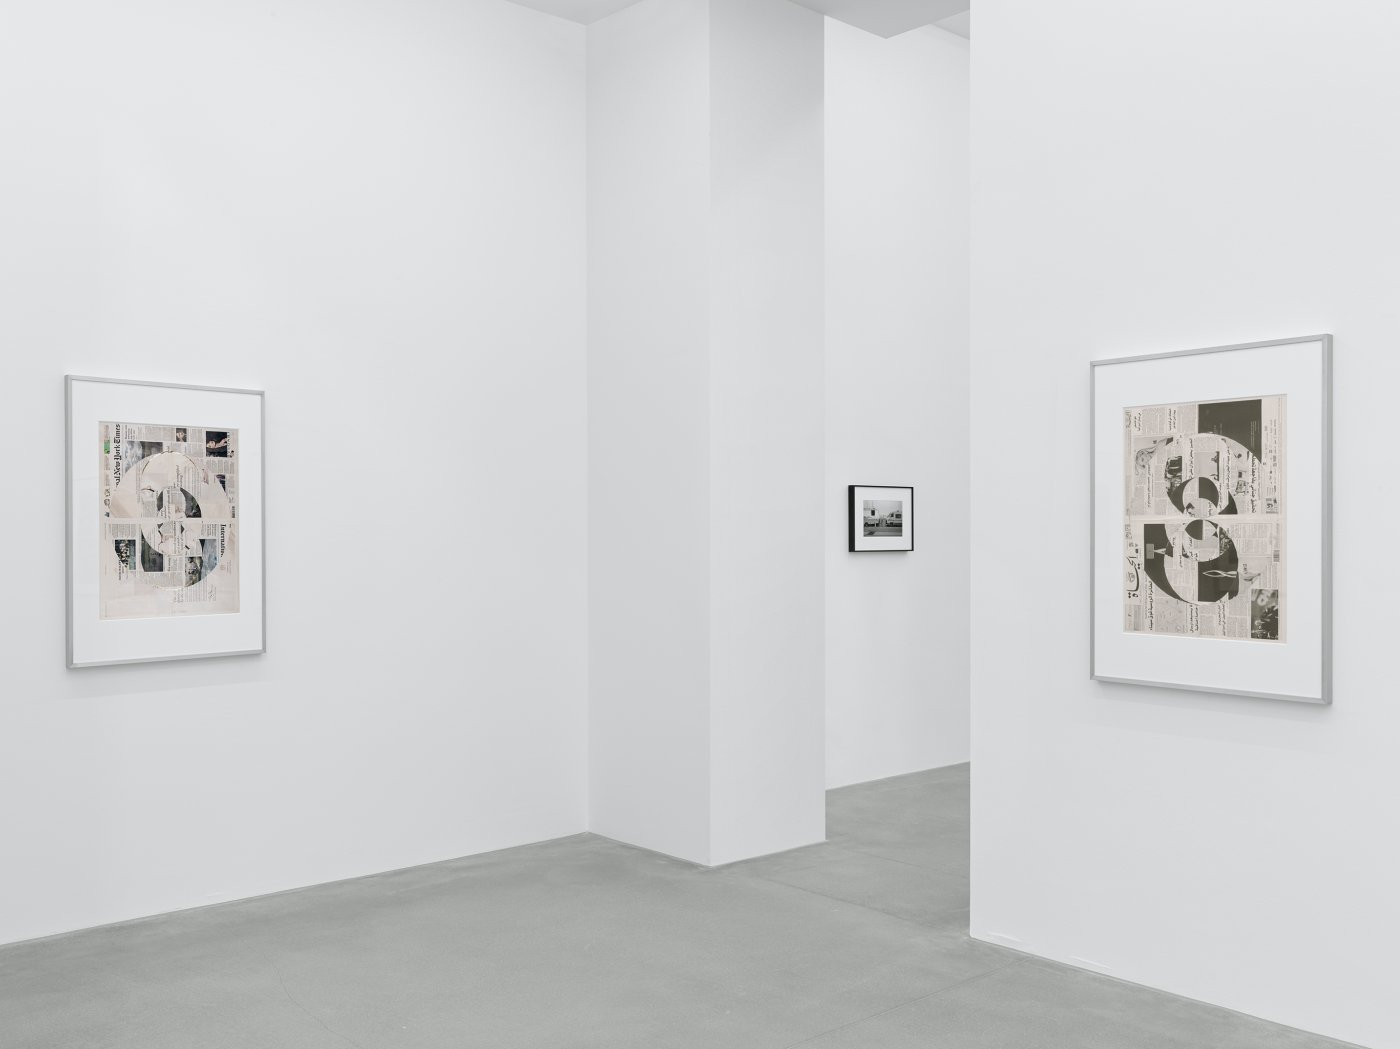 Galerie Eva Presenhuber Waldmanstrasse Walead Beshty 4